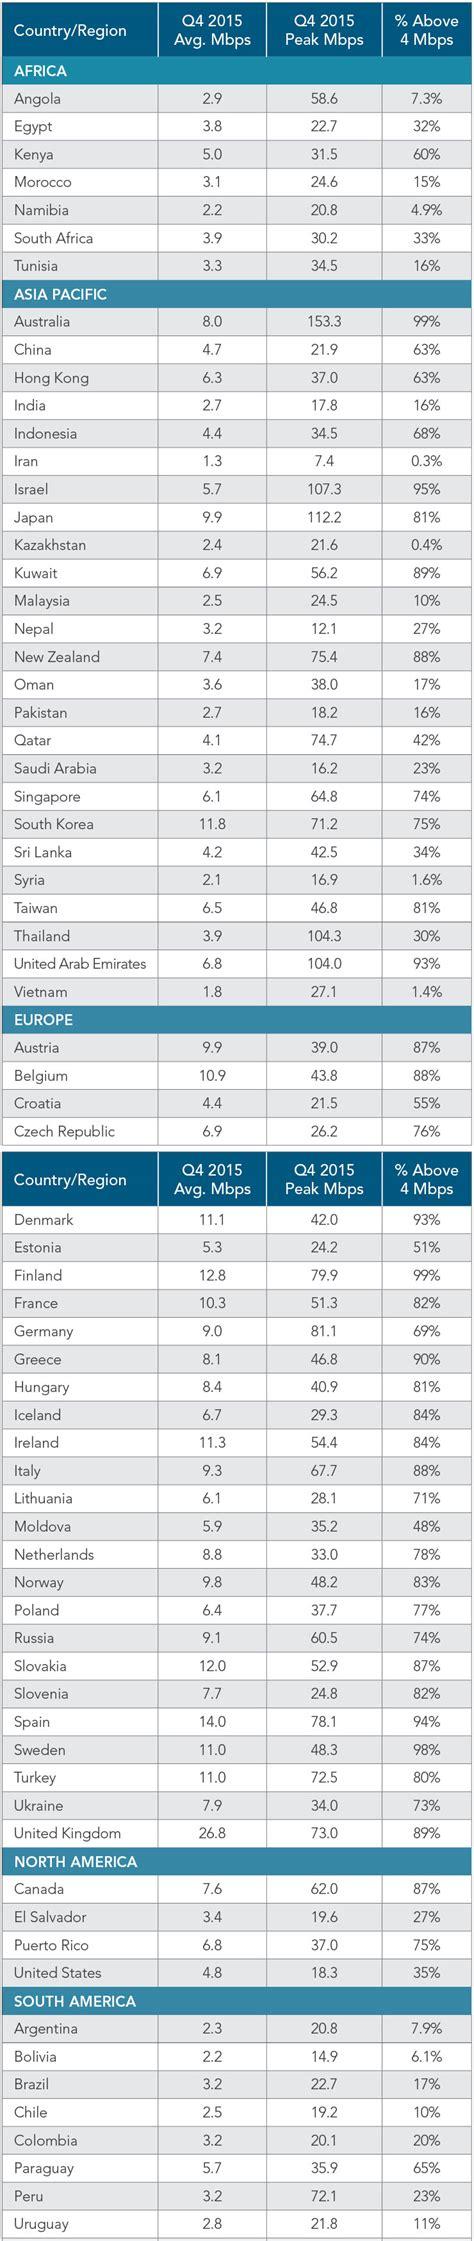 mobile speeds mobile broadband speeds south africa vs the world